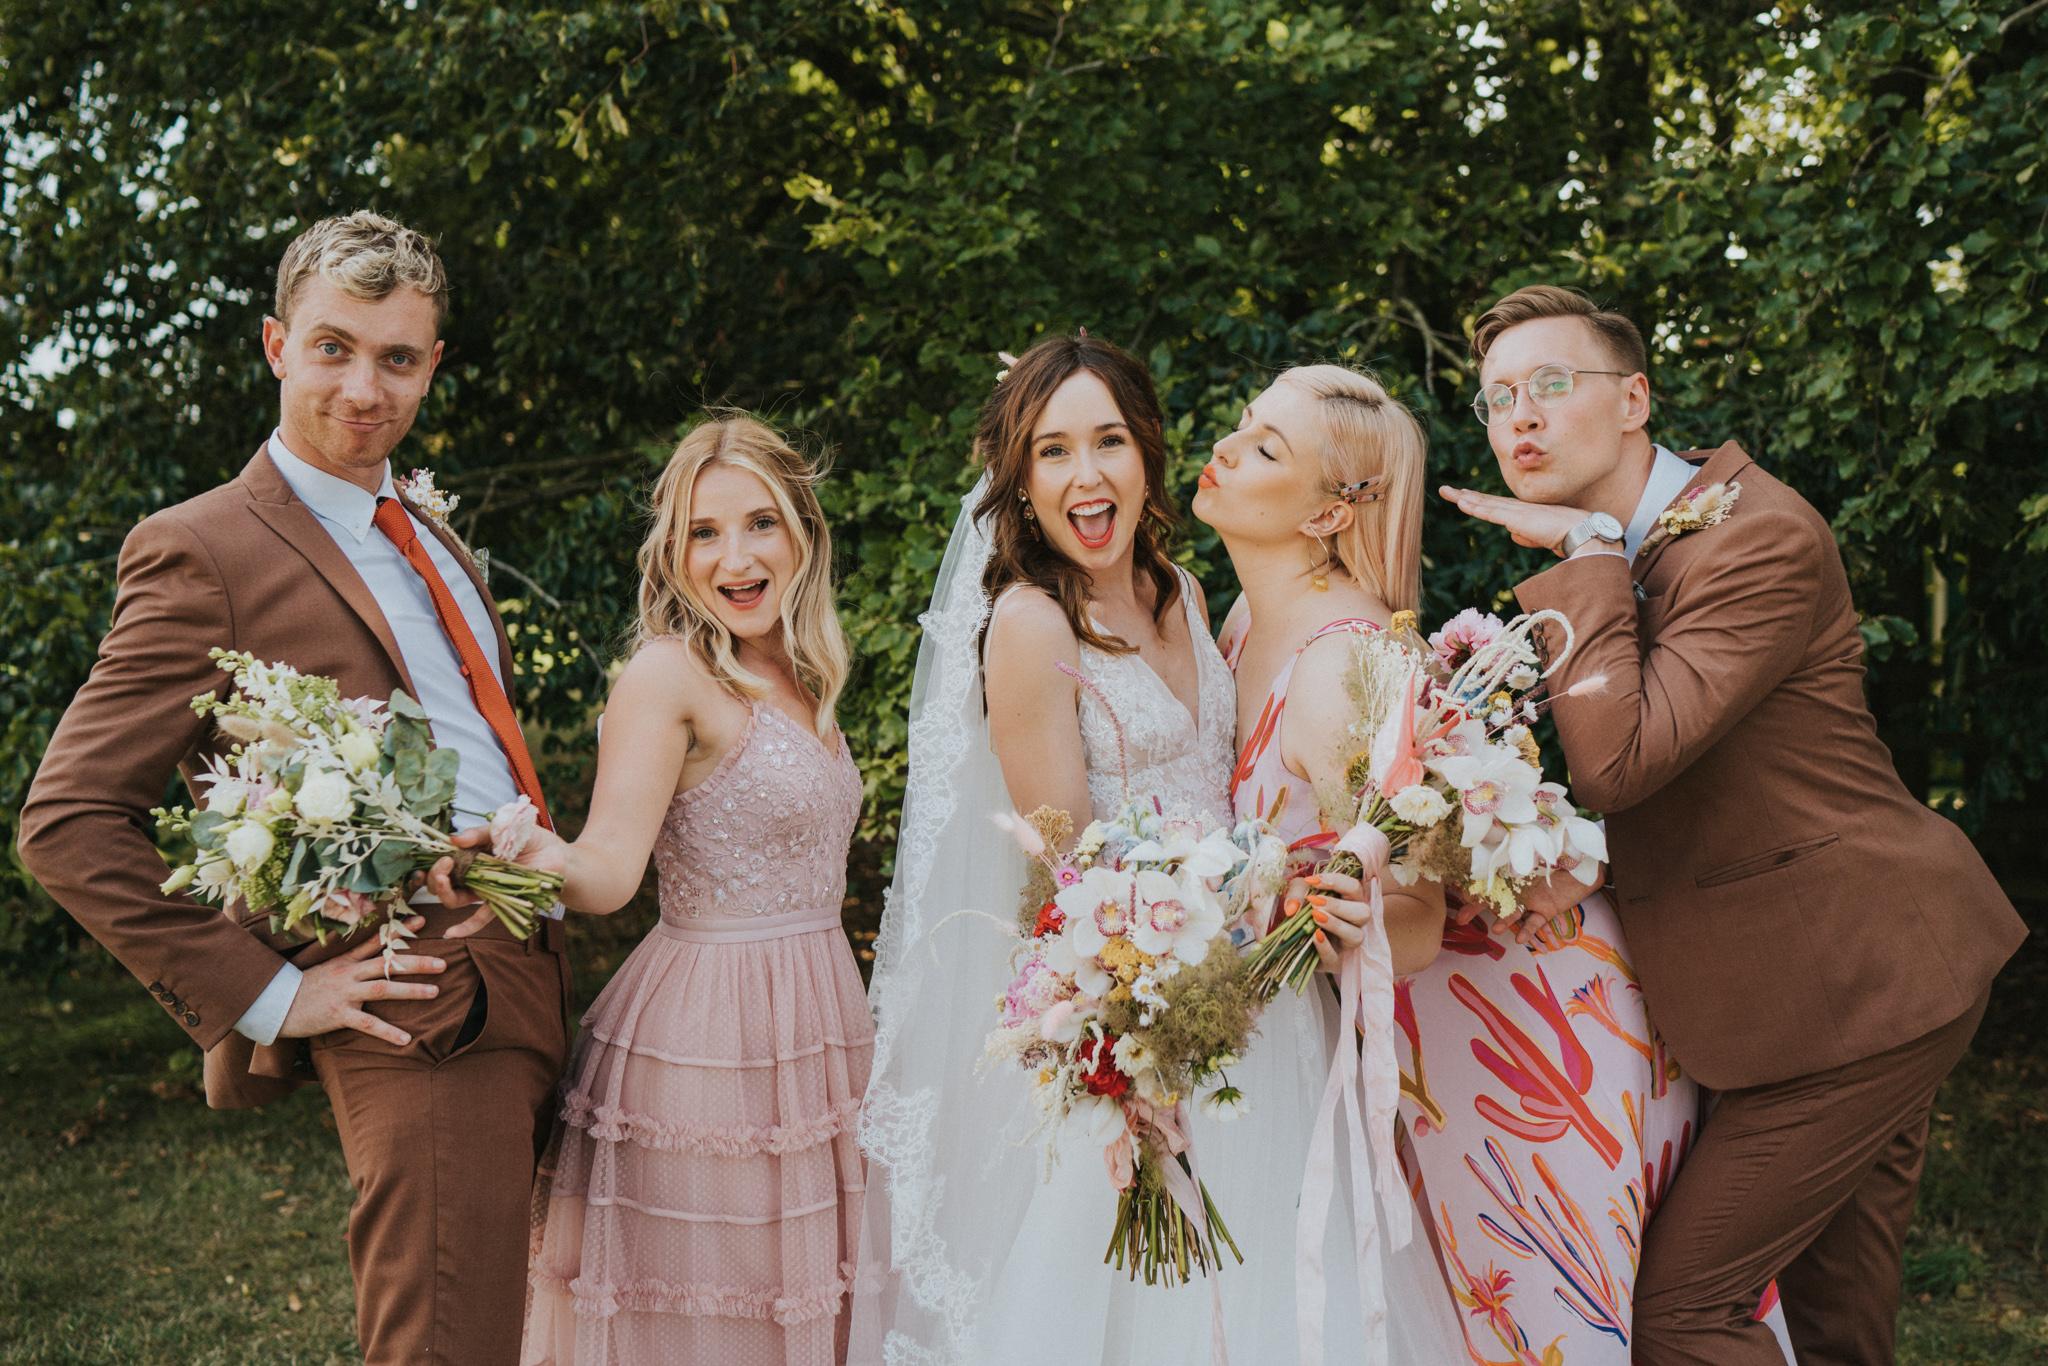 emi-Jack-boho-diy-wedding-eggington-house-grace-elizabeth-colchester-essex-alternative-wedding-photographer-suffolk-norfolk-devon (26 of 56).jpg